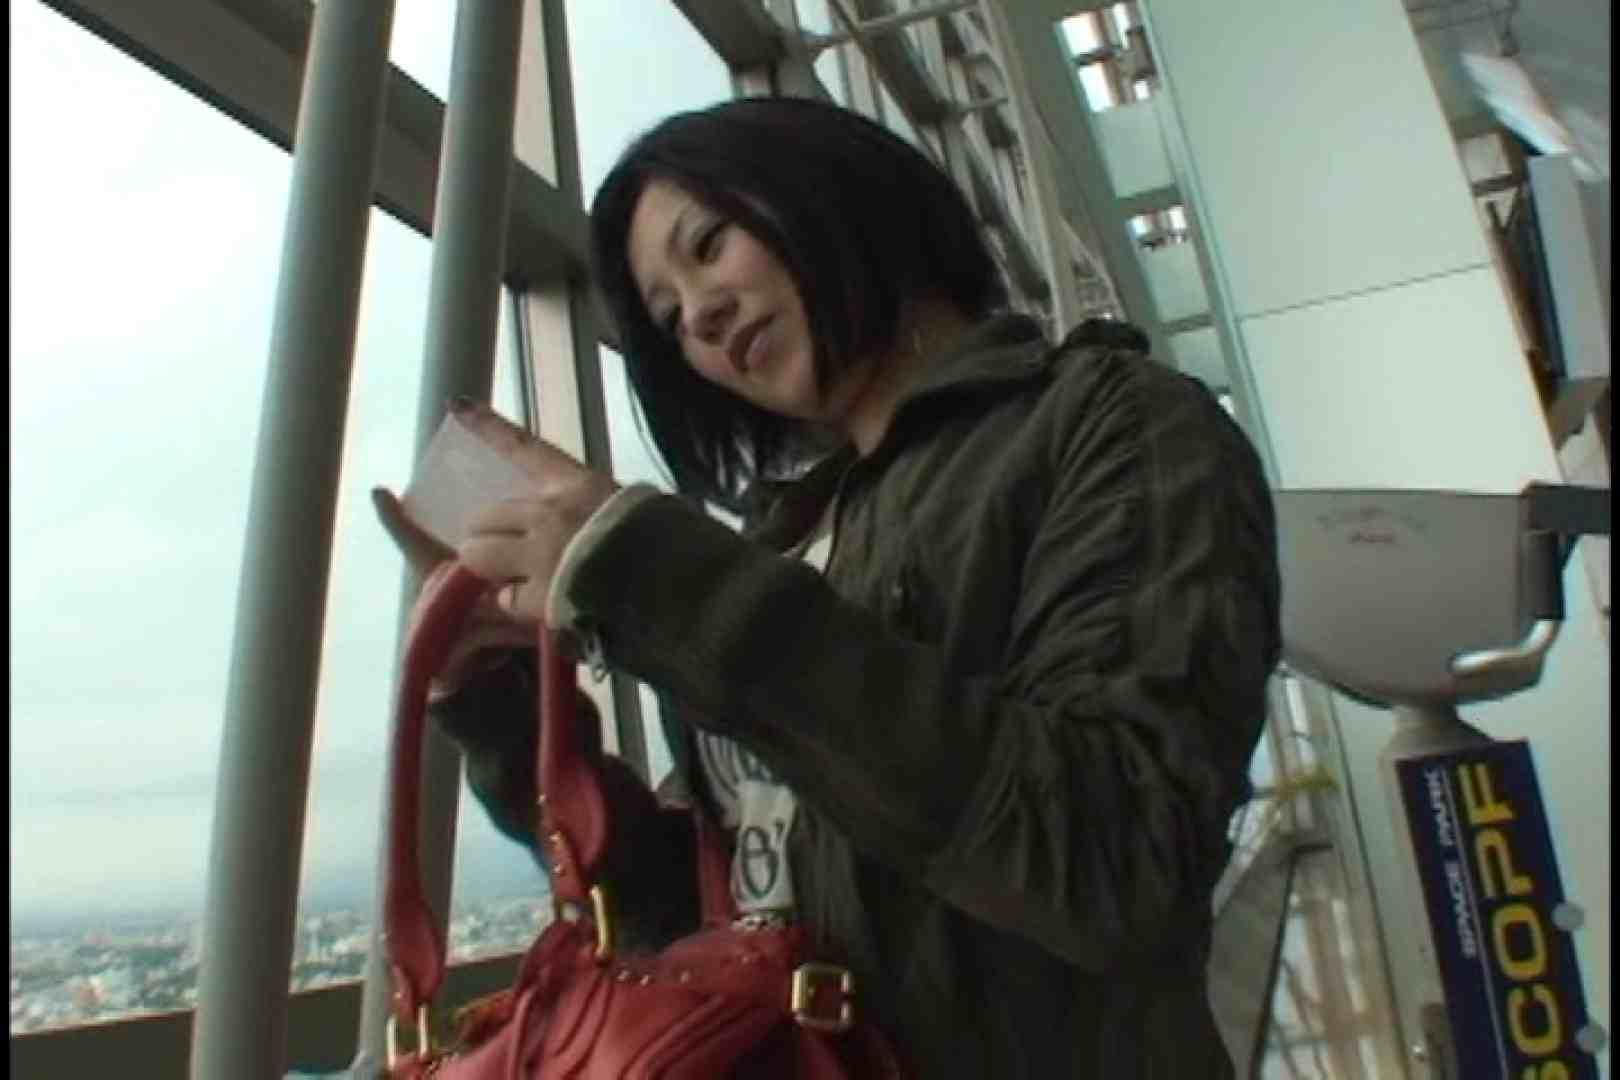 JDハンター全国ツアー vol.008 前編 女子大生 | OLエロ画像  72PICs 25